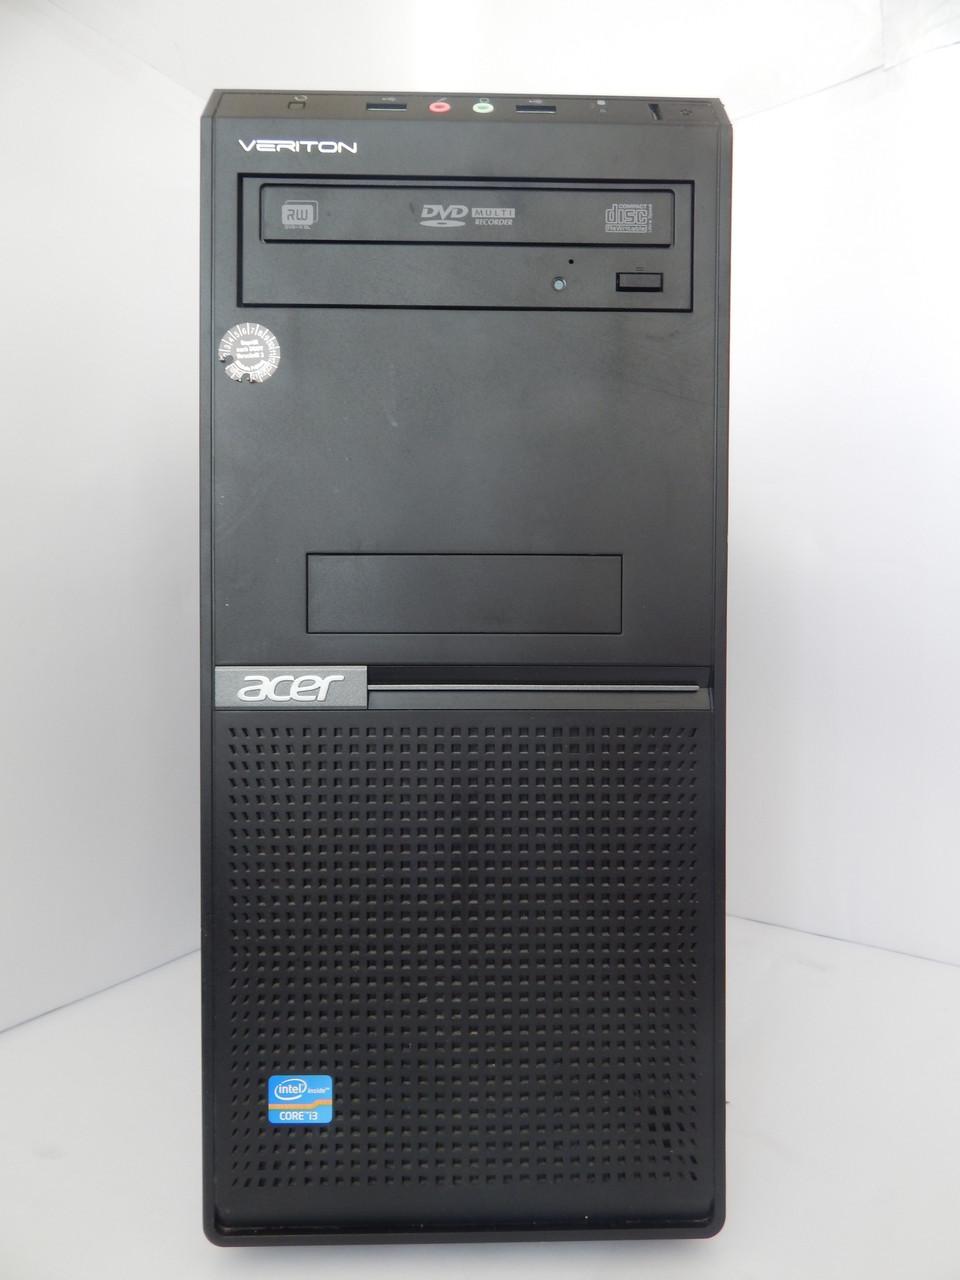 Системный блок Acer Veriton E430 i3-3220 RAM 4 ГБ